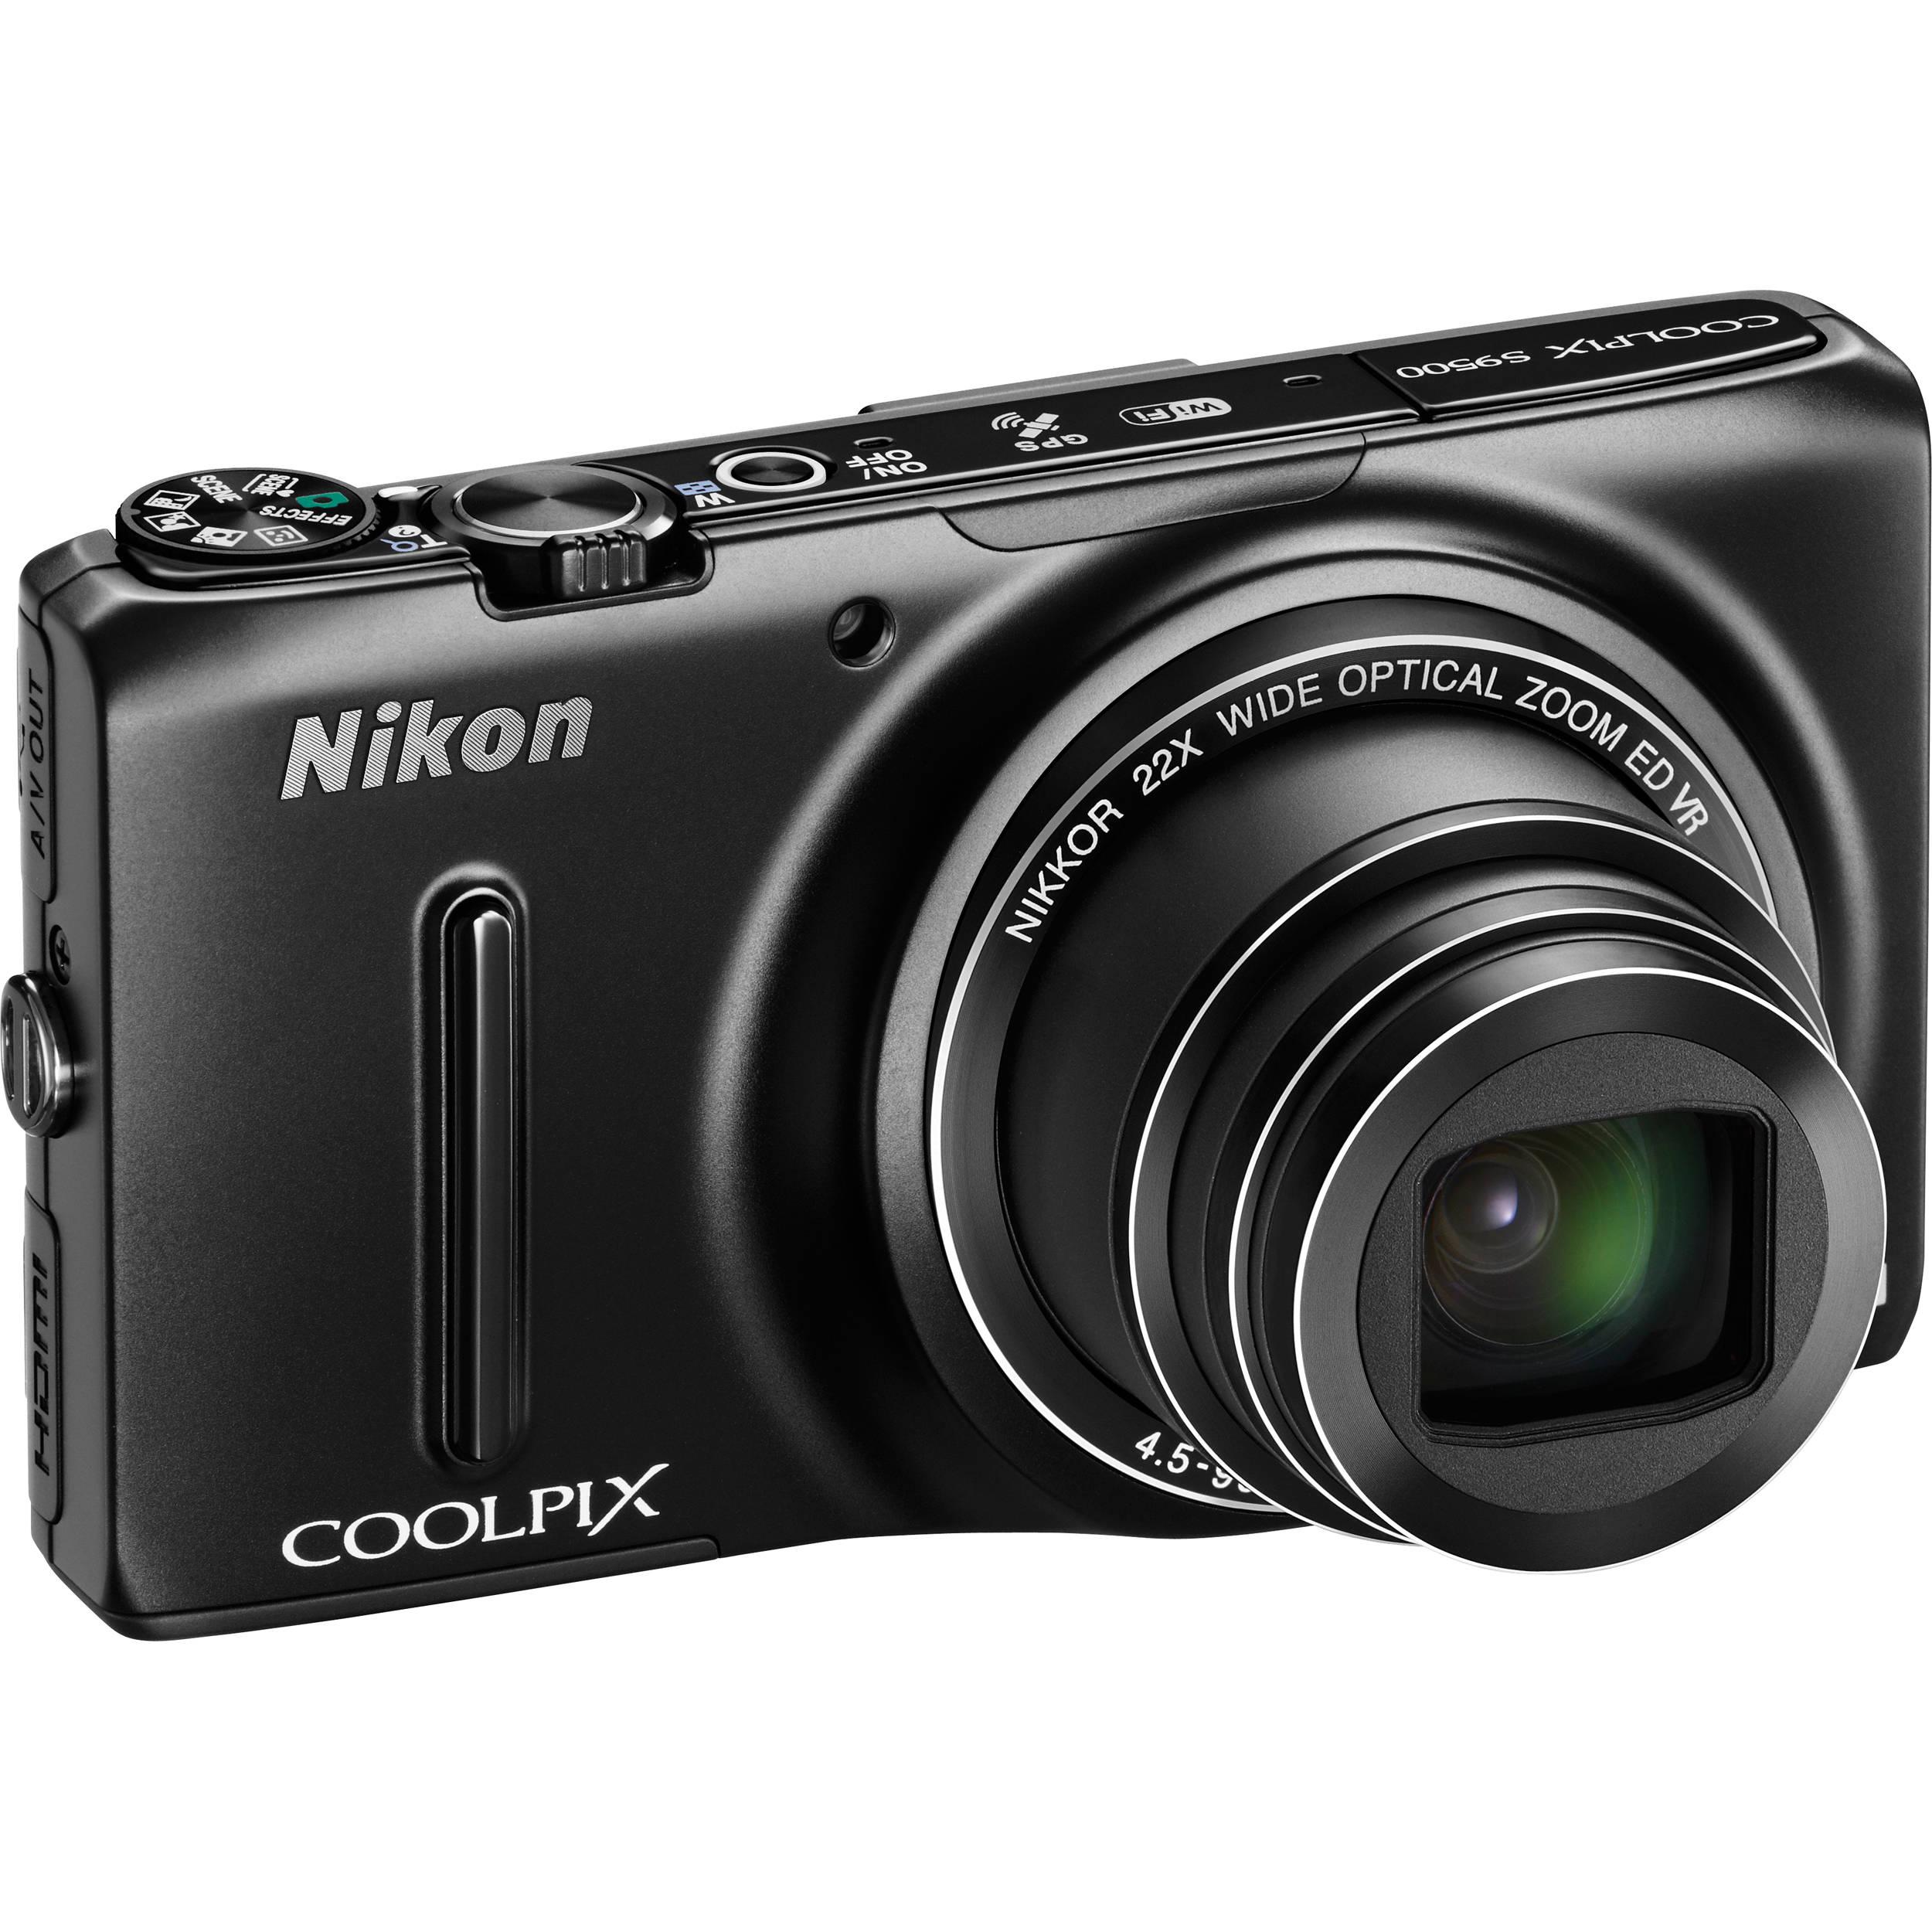 Nikon COOLPIX S9500 Digital Camera (Black) 26418 B&H Photo Video